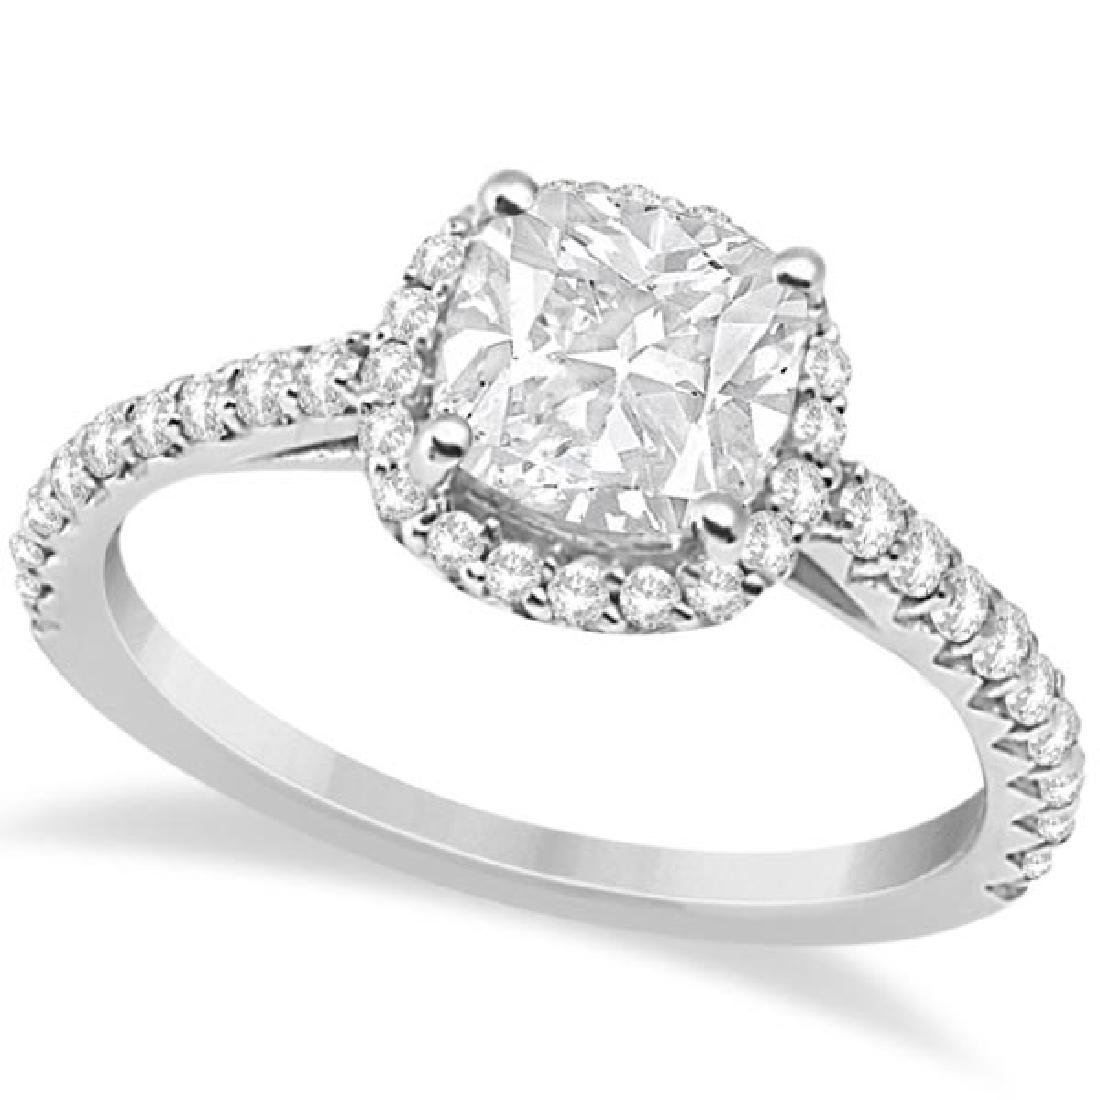 Halo Design Cushion Cut Diamond Engagement Ring 14K Whi